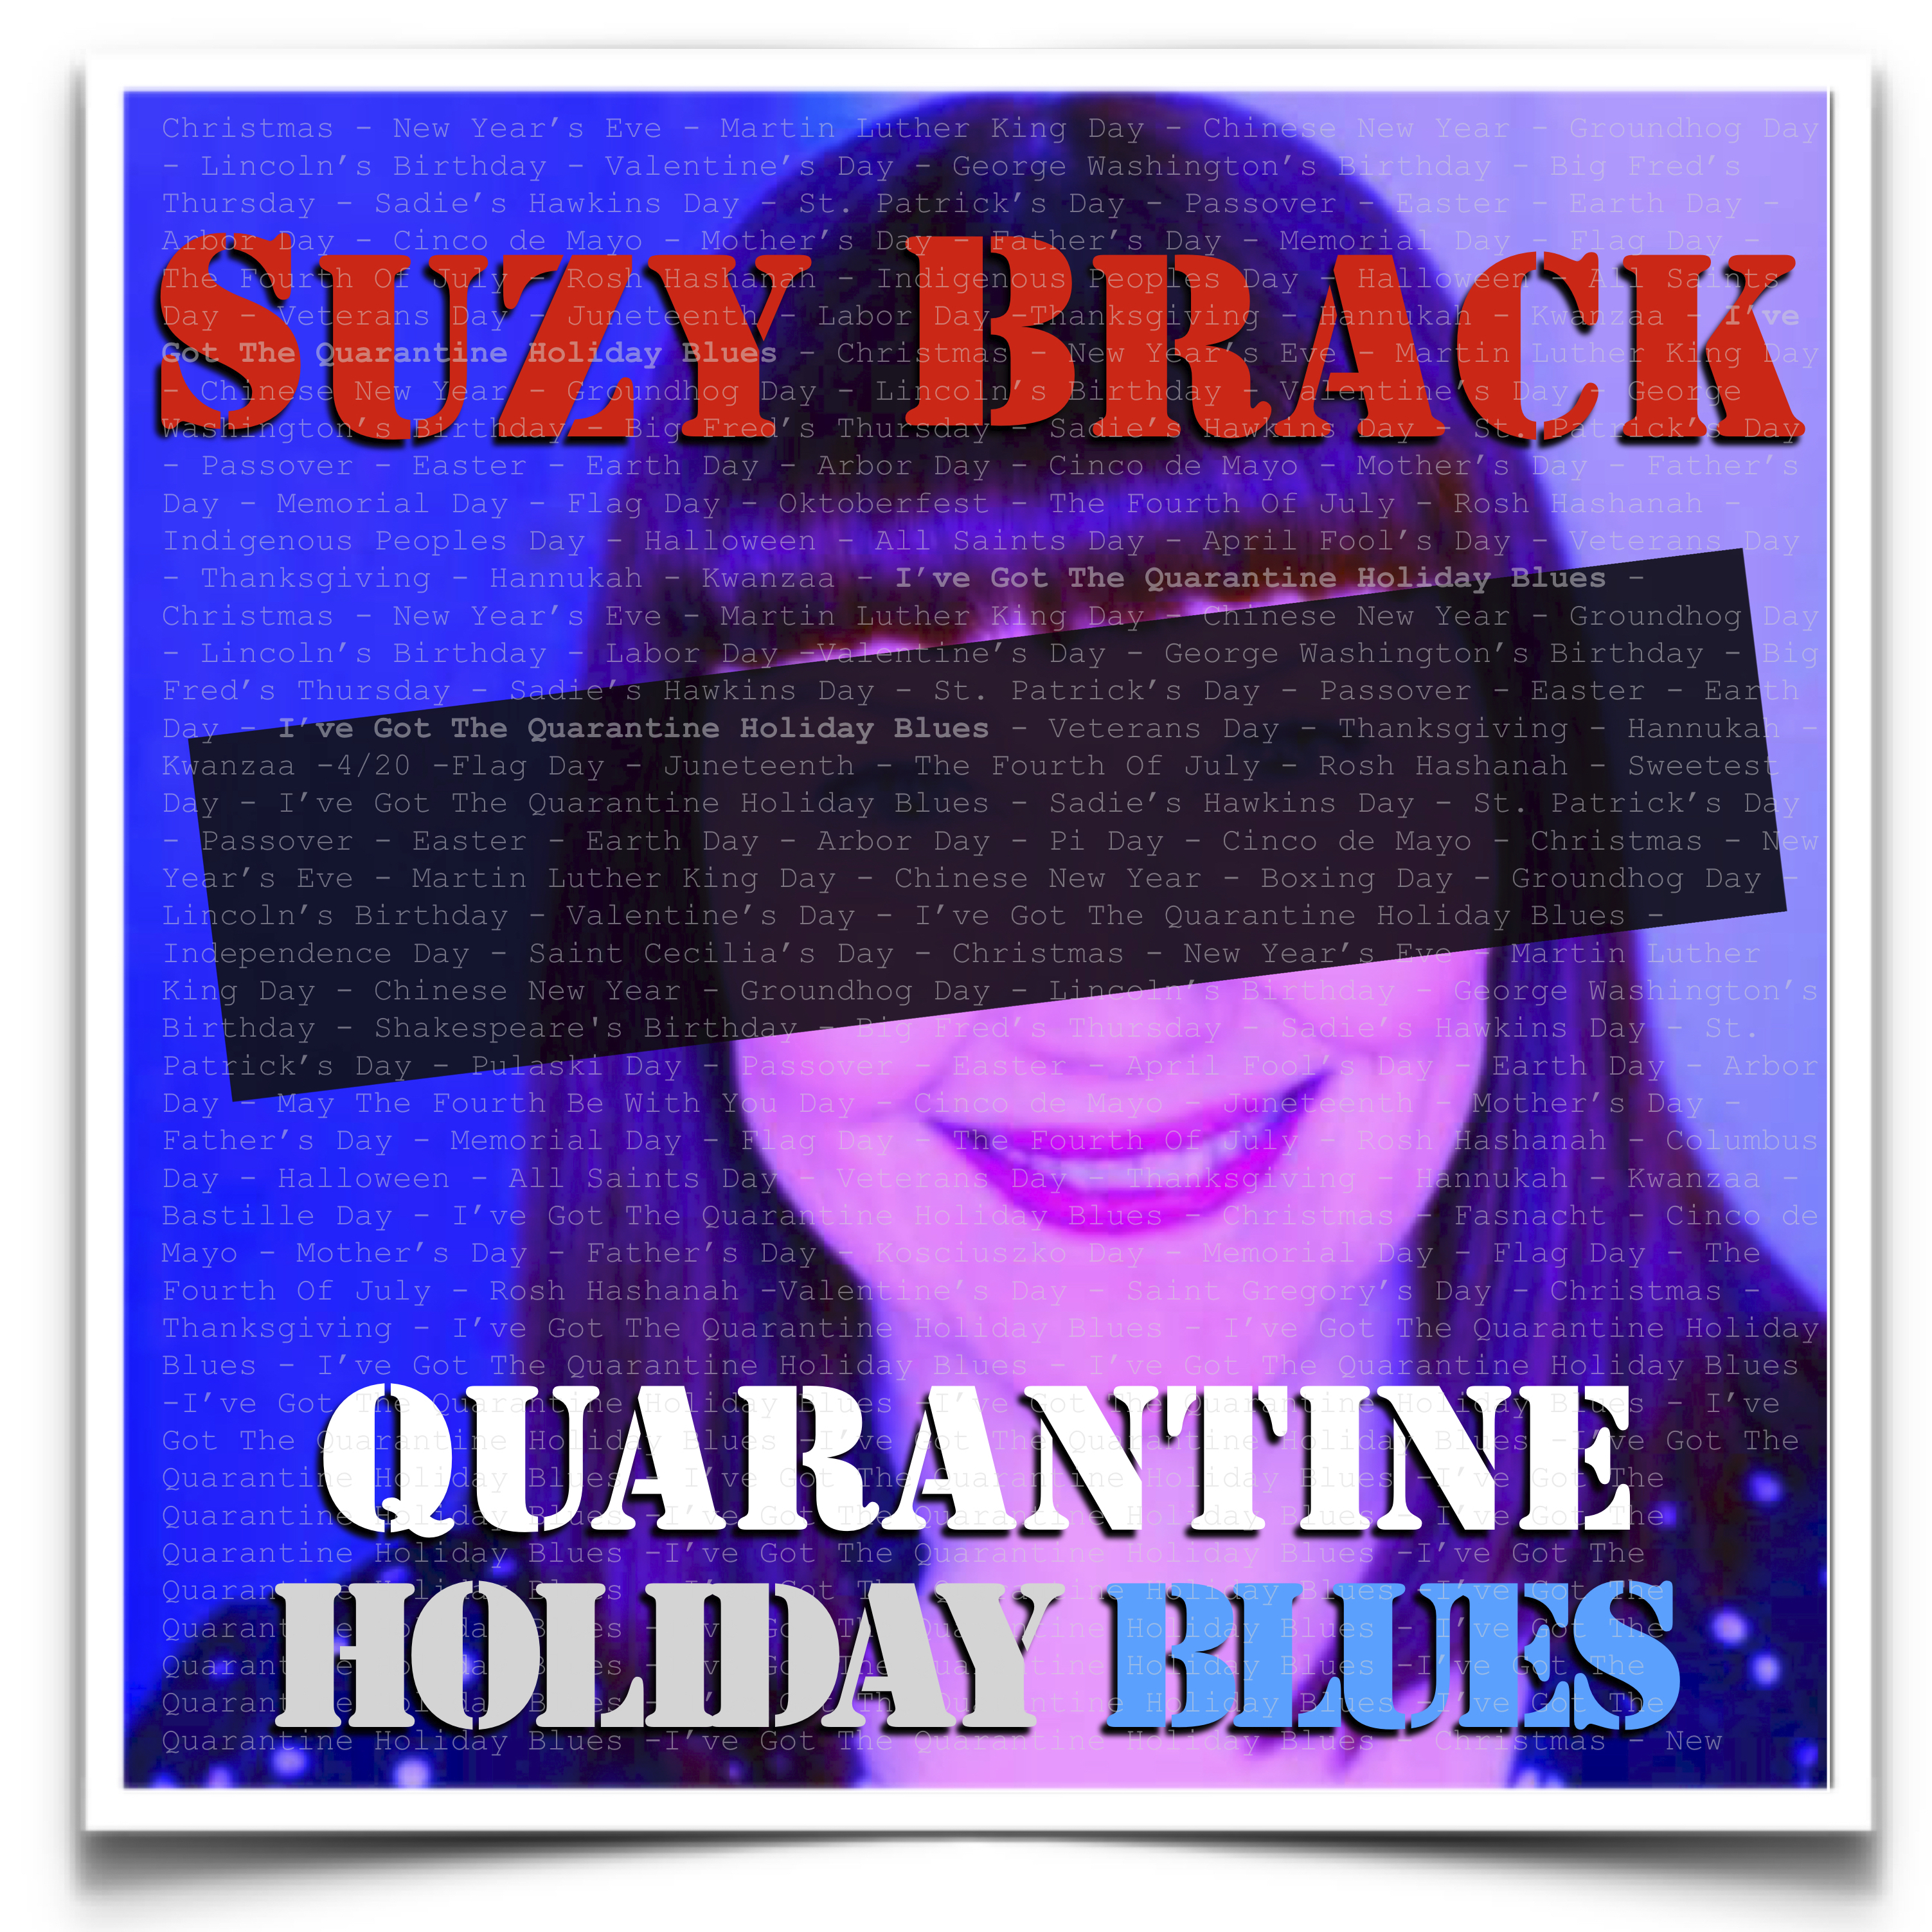 https://suzybrack.hearnow.com | Quarantine Holiday Blues | CD